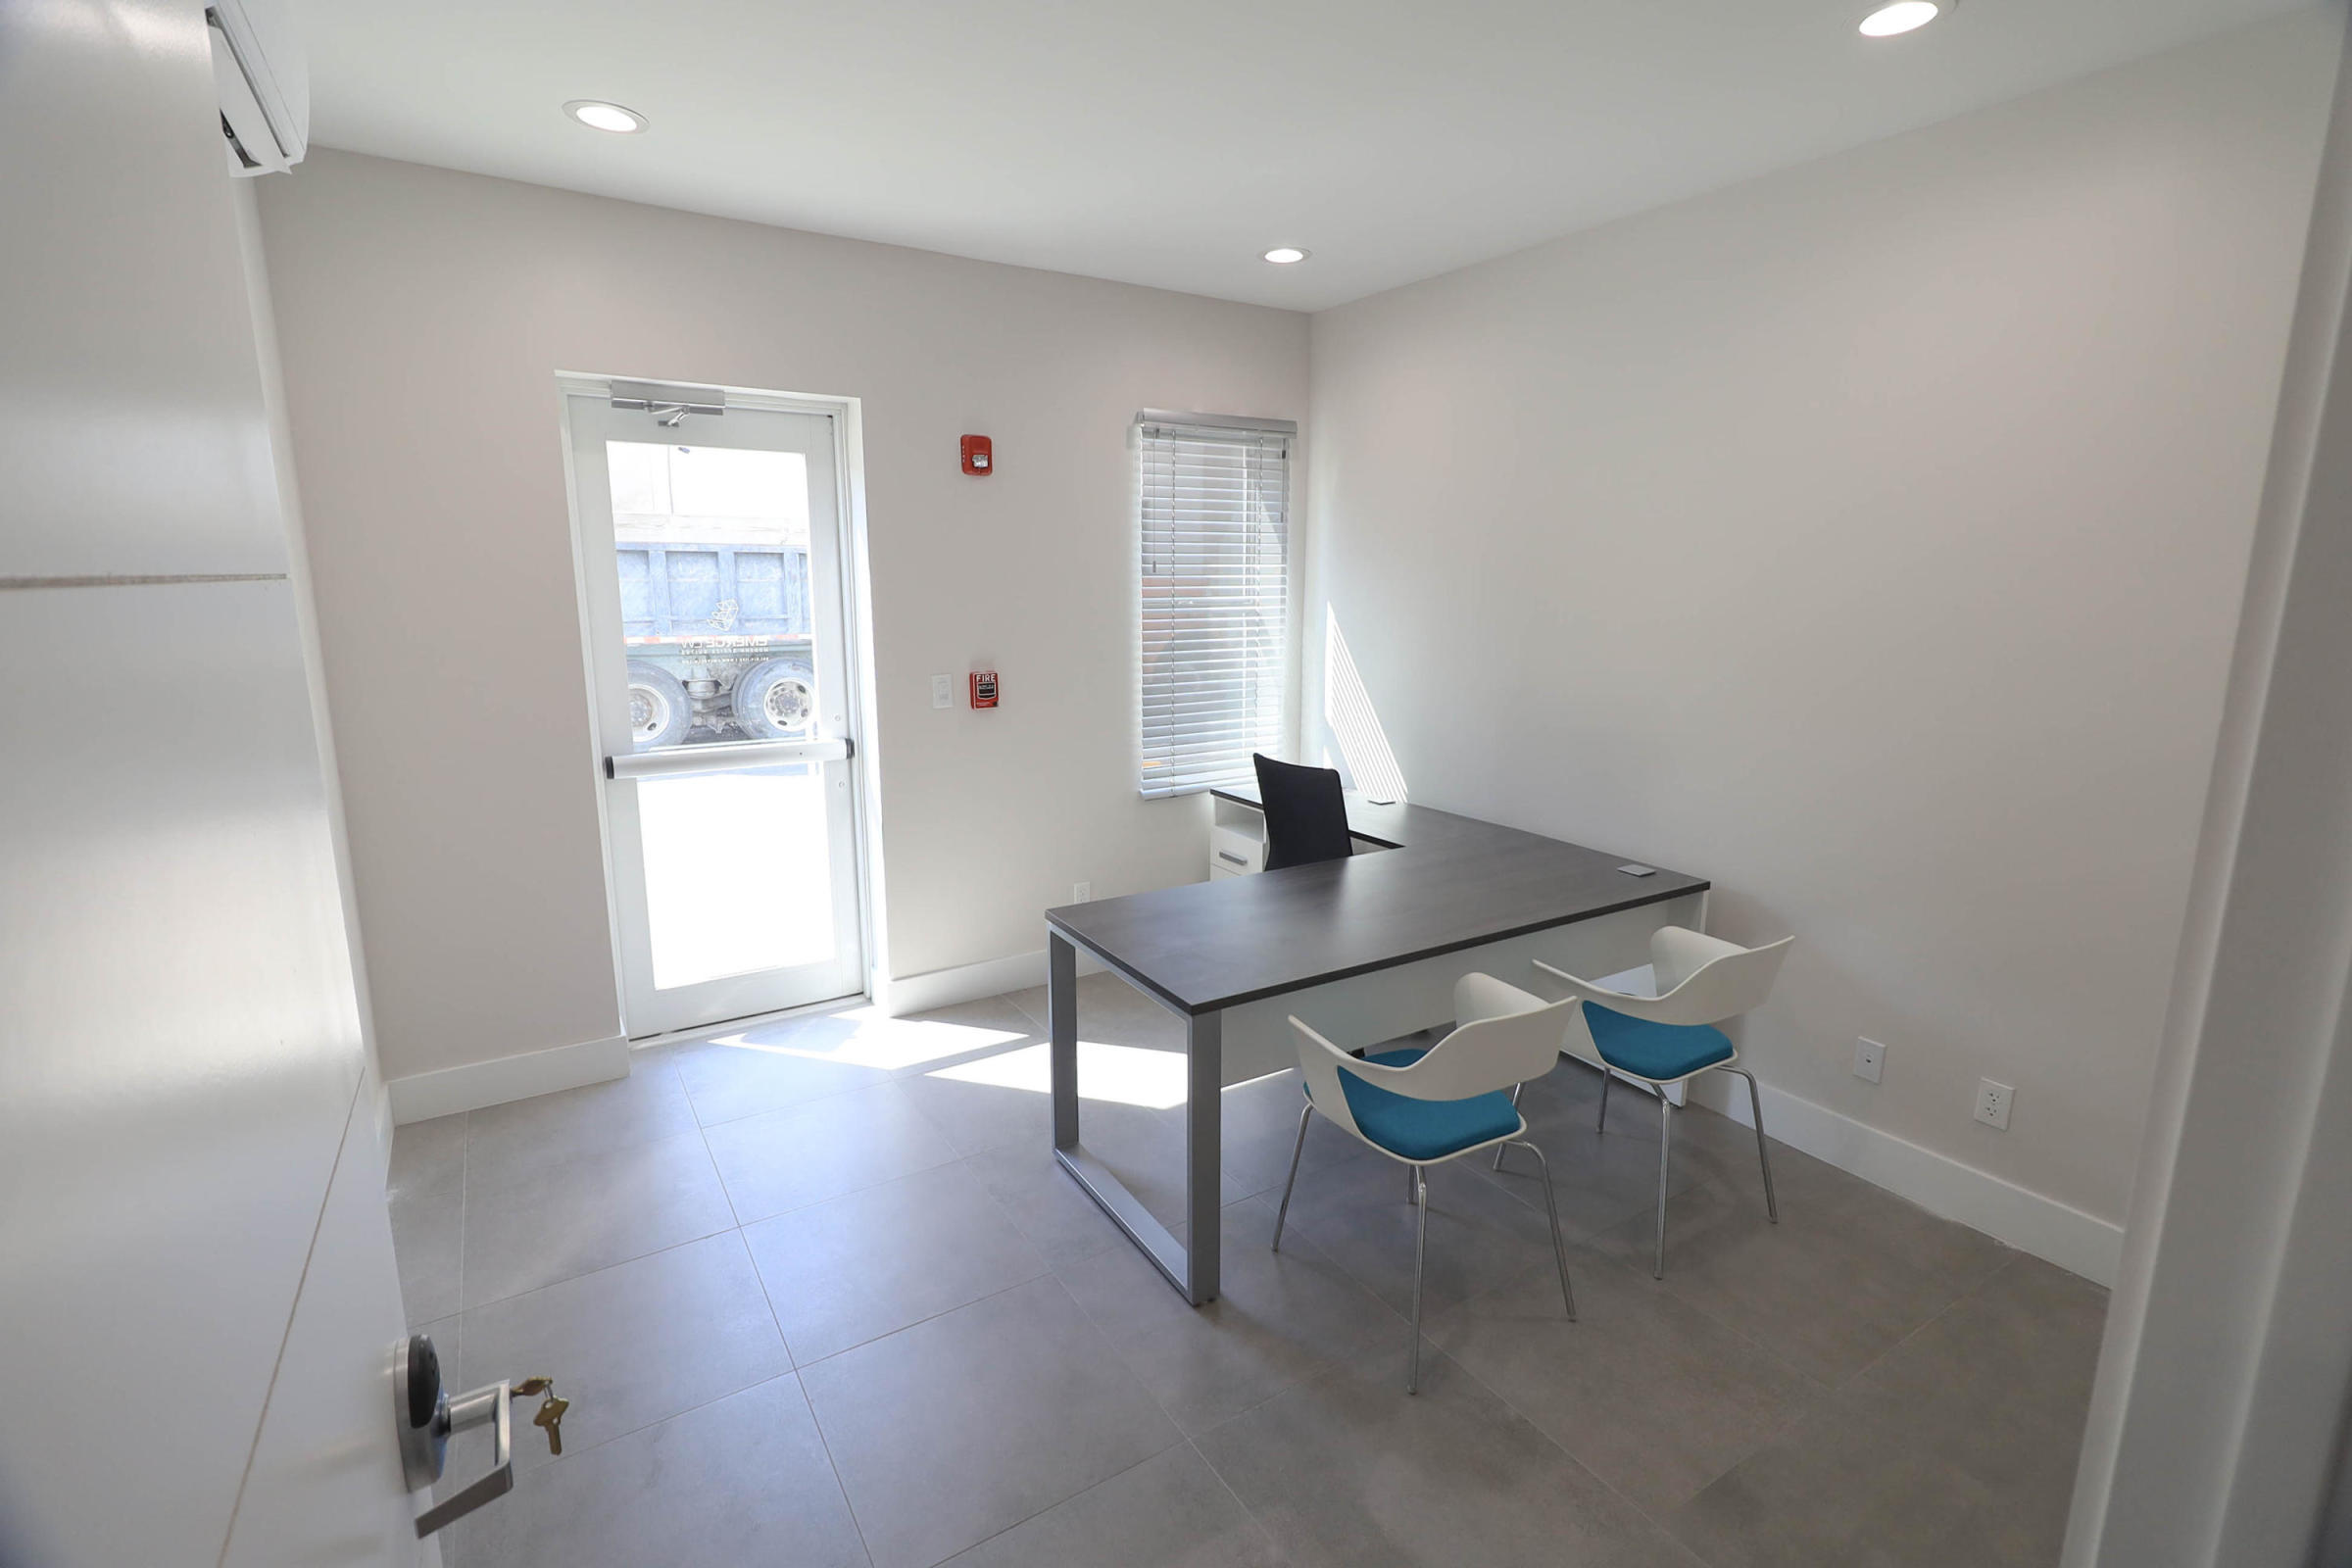 631 Lucerne Avenue, Lake Worth Beach, Florida 33460, ,4 BathroomsBathrooms,Office,For Sale,Lucerne,RX-10670348